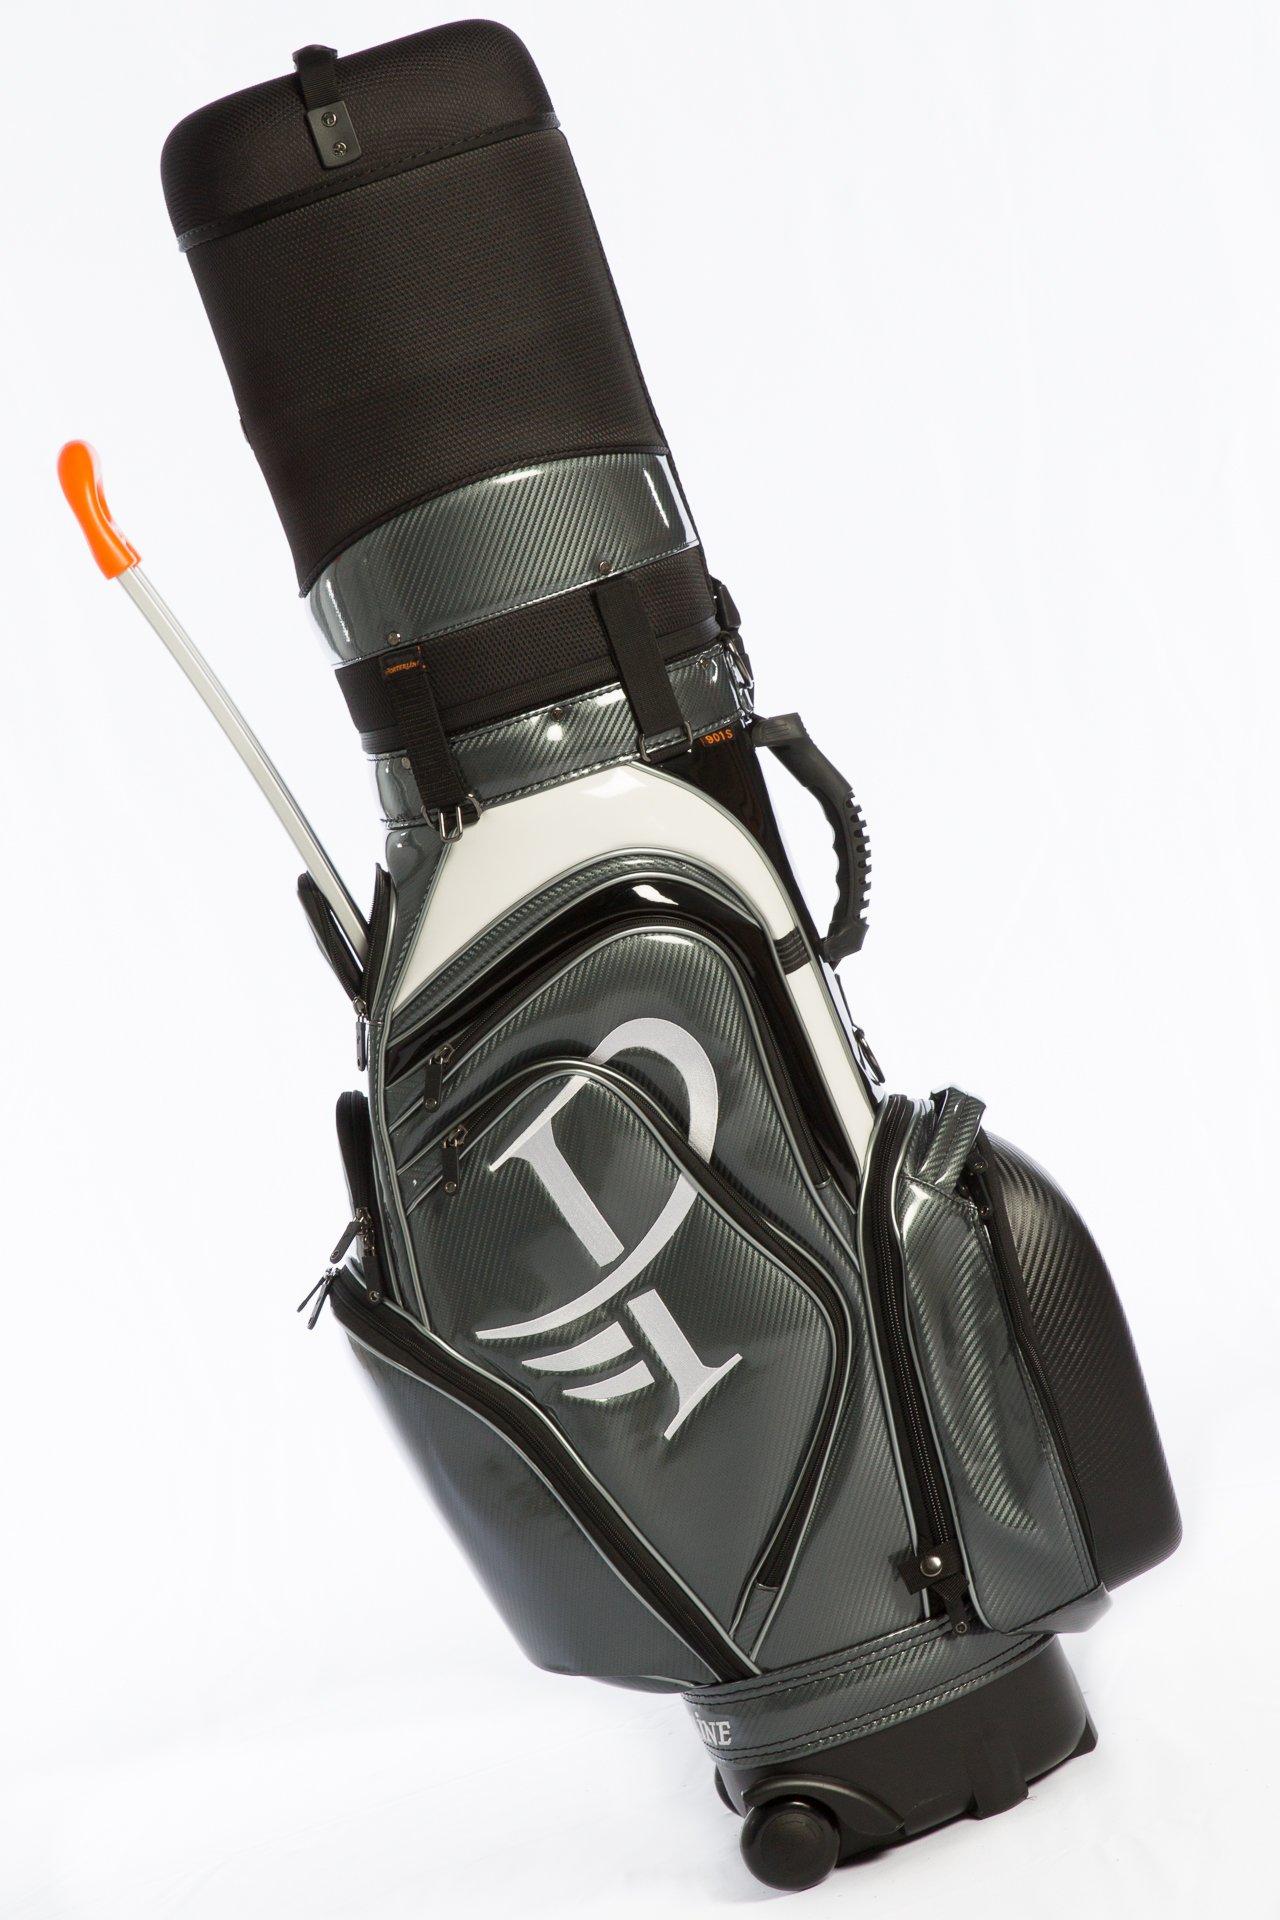 Porterline Travel Cover Golf Bag 901s-00 (Black)